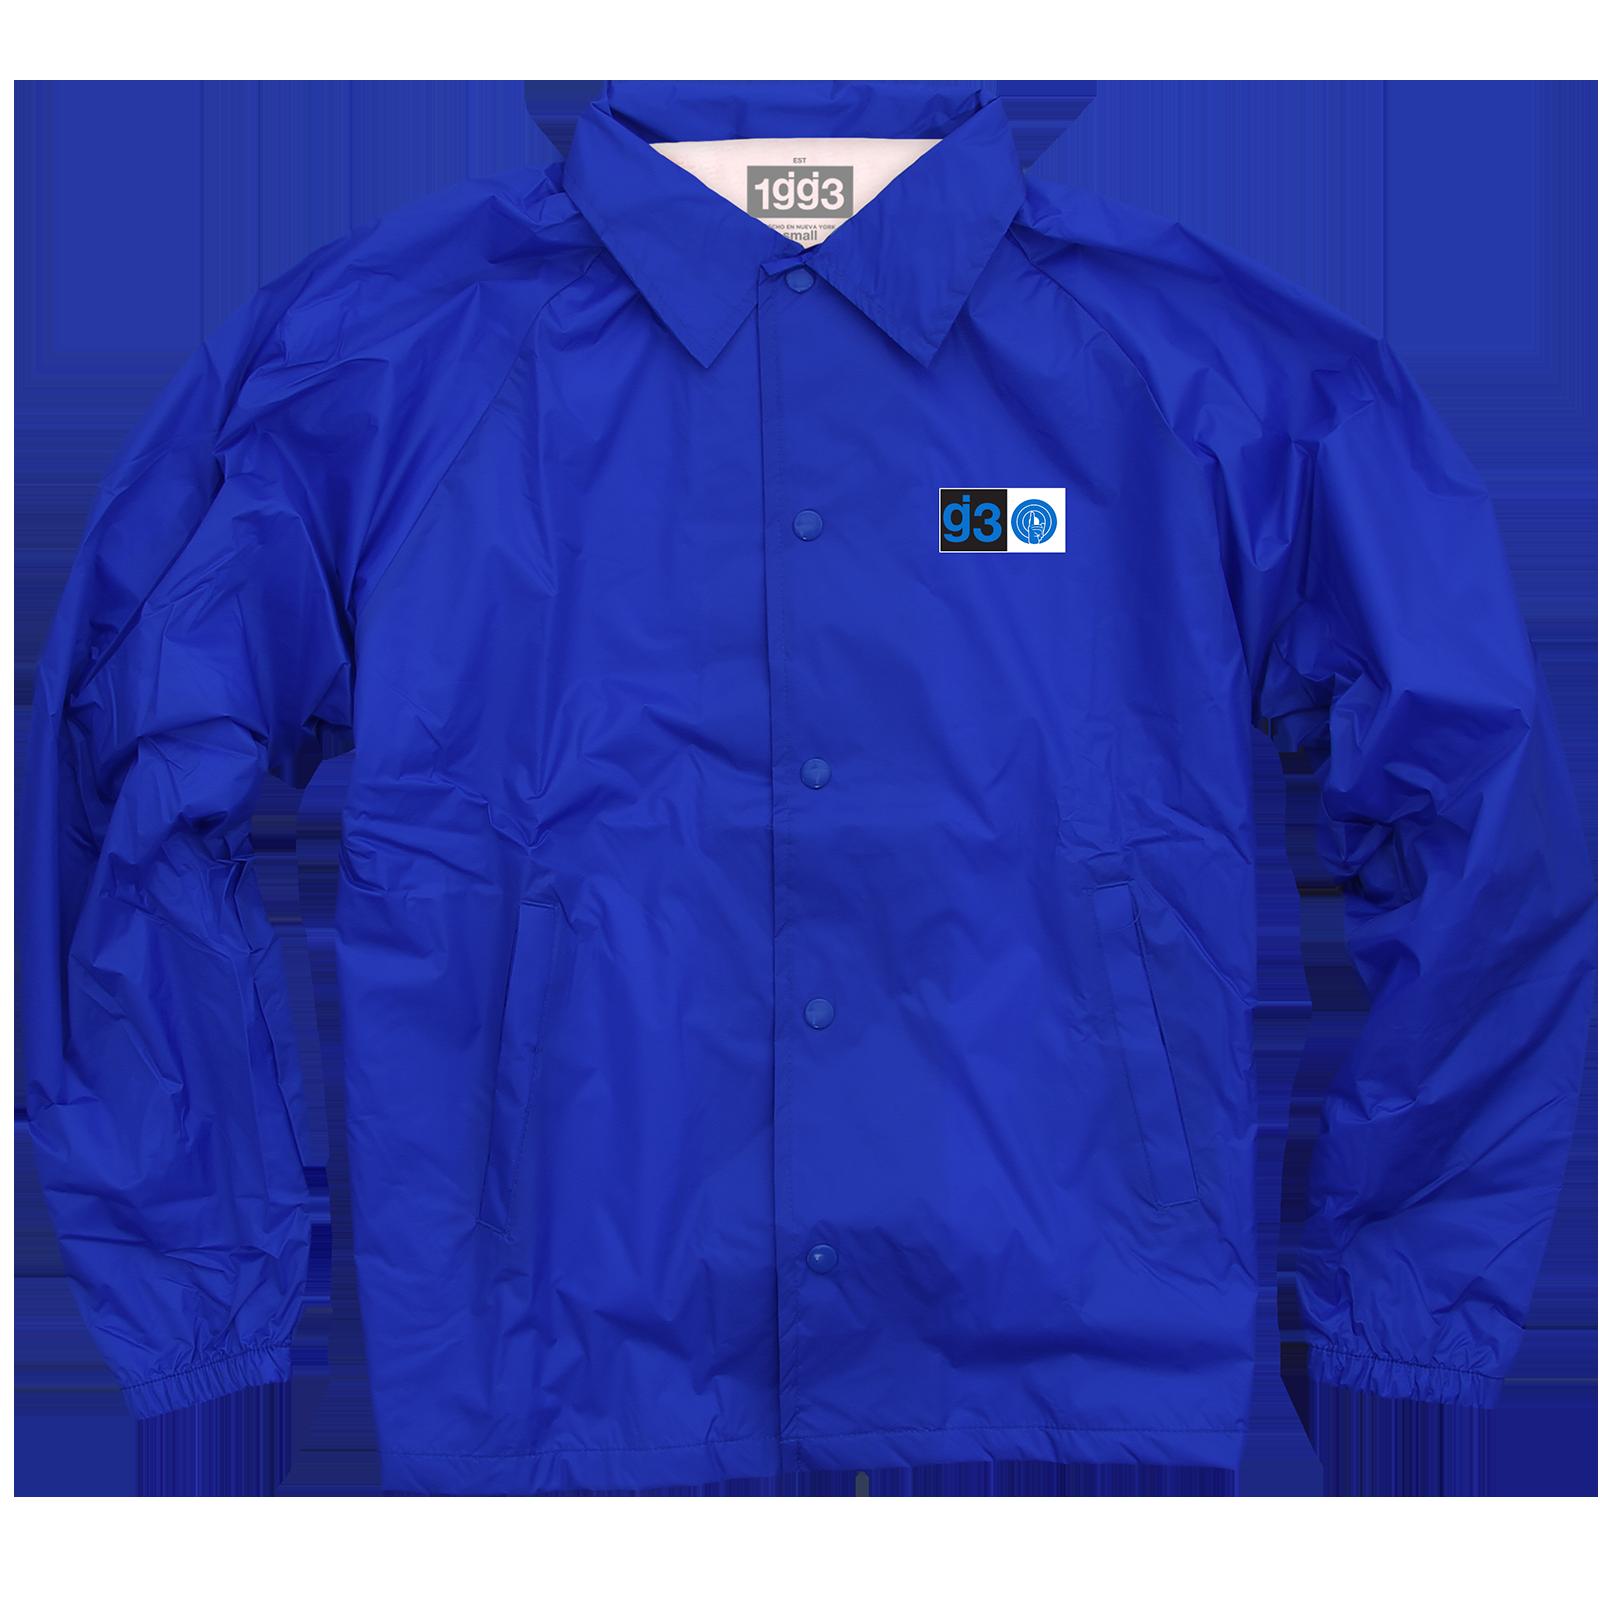 eyewtkas blue coaches jacket glassjaw